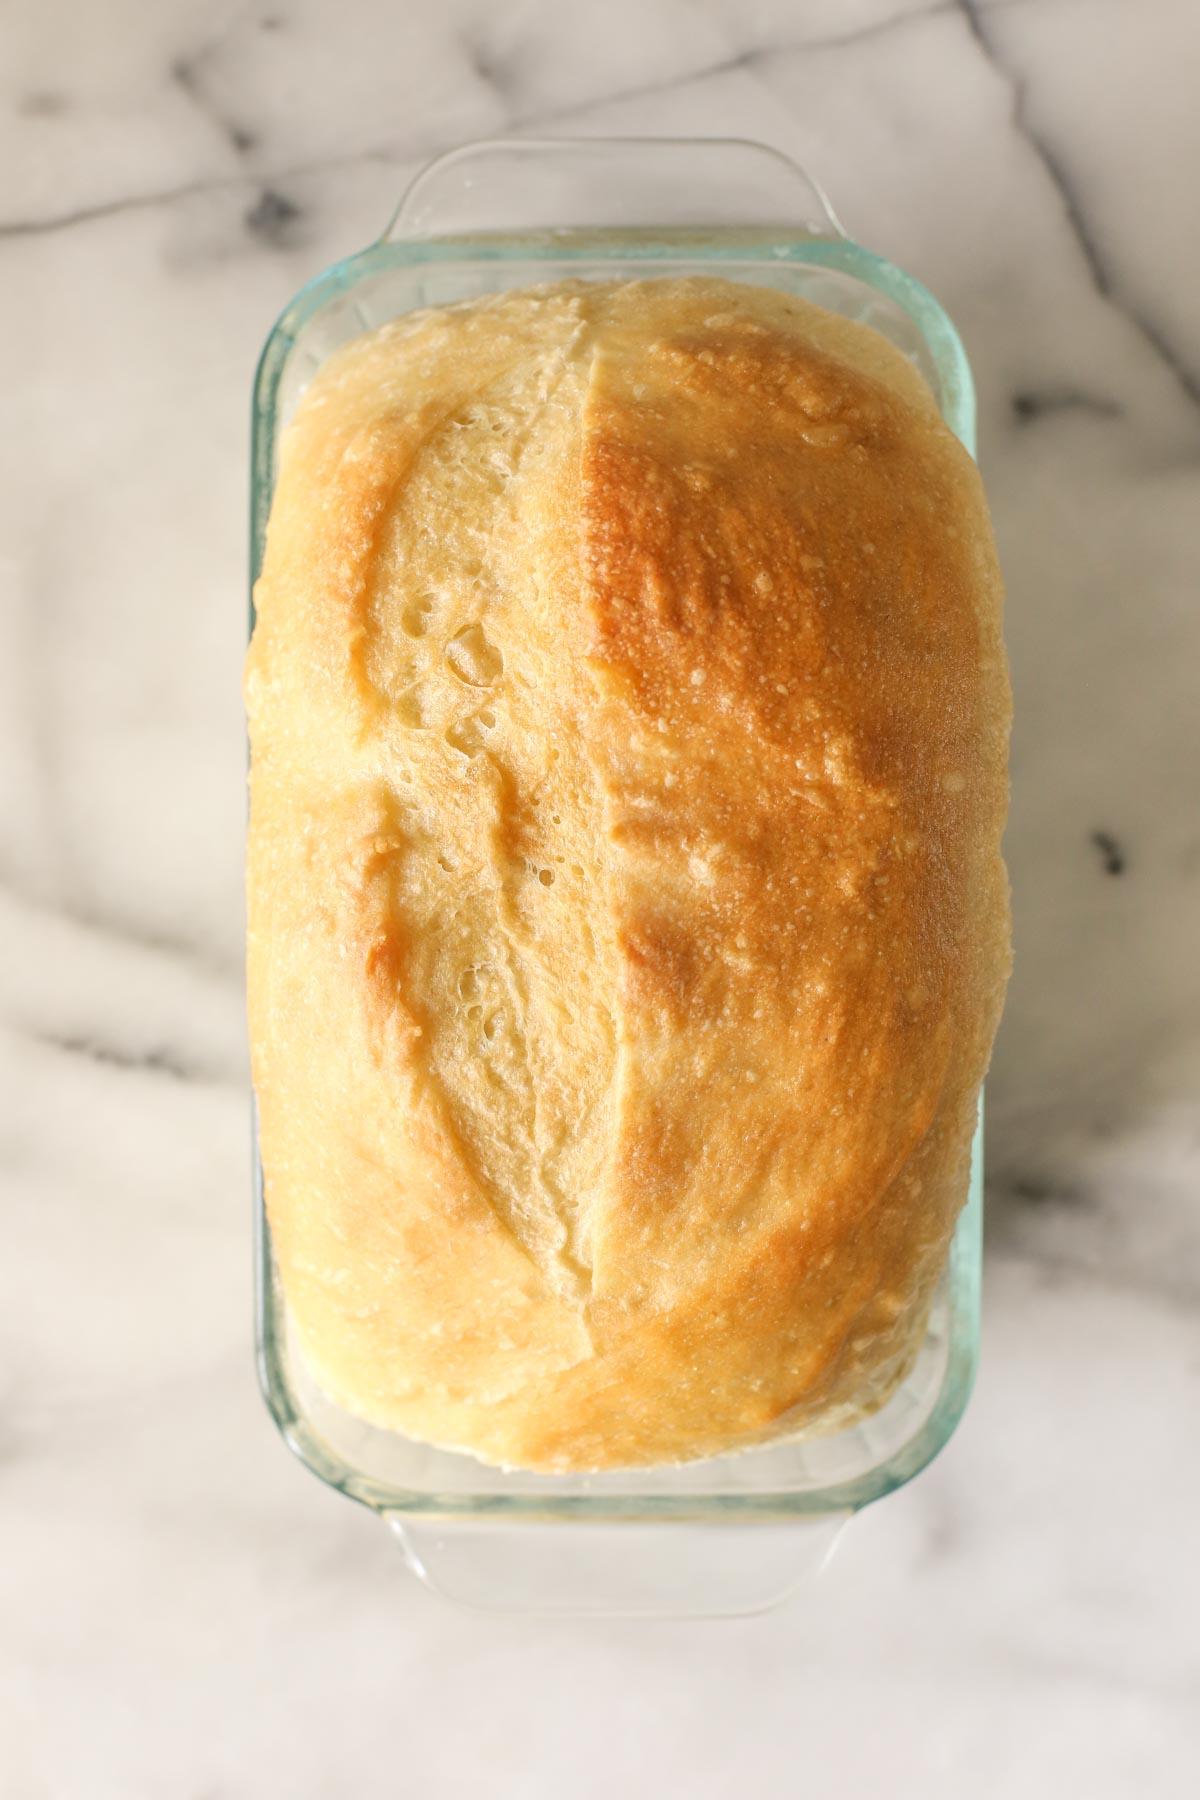 Overhead shot of a Sourdough Sandwich Loaf after baking.